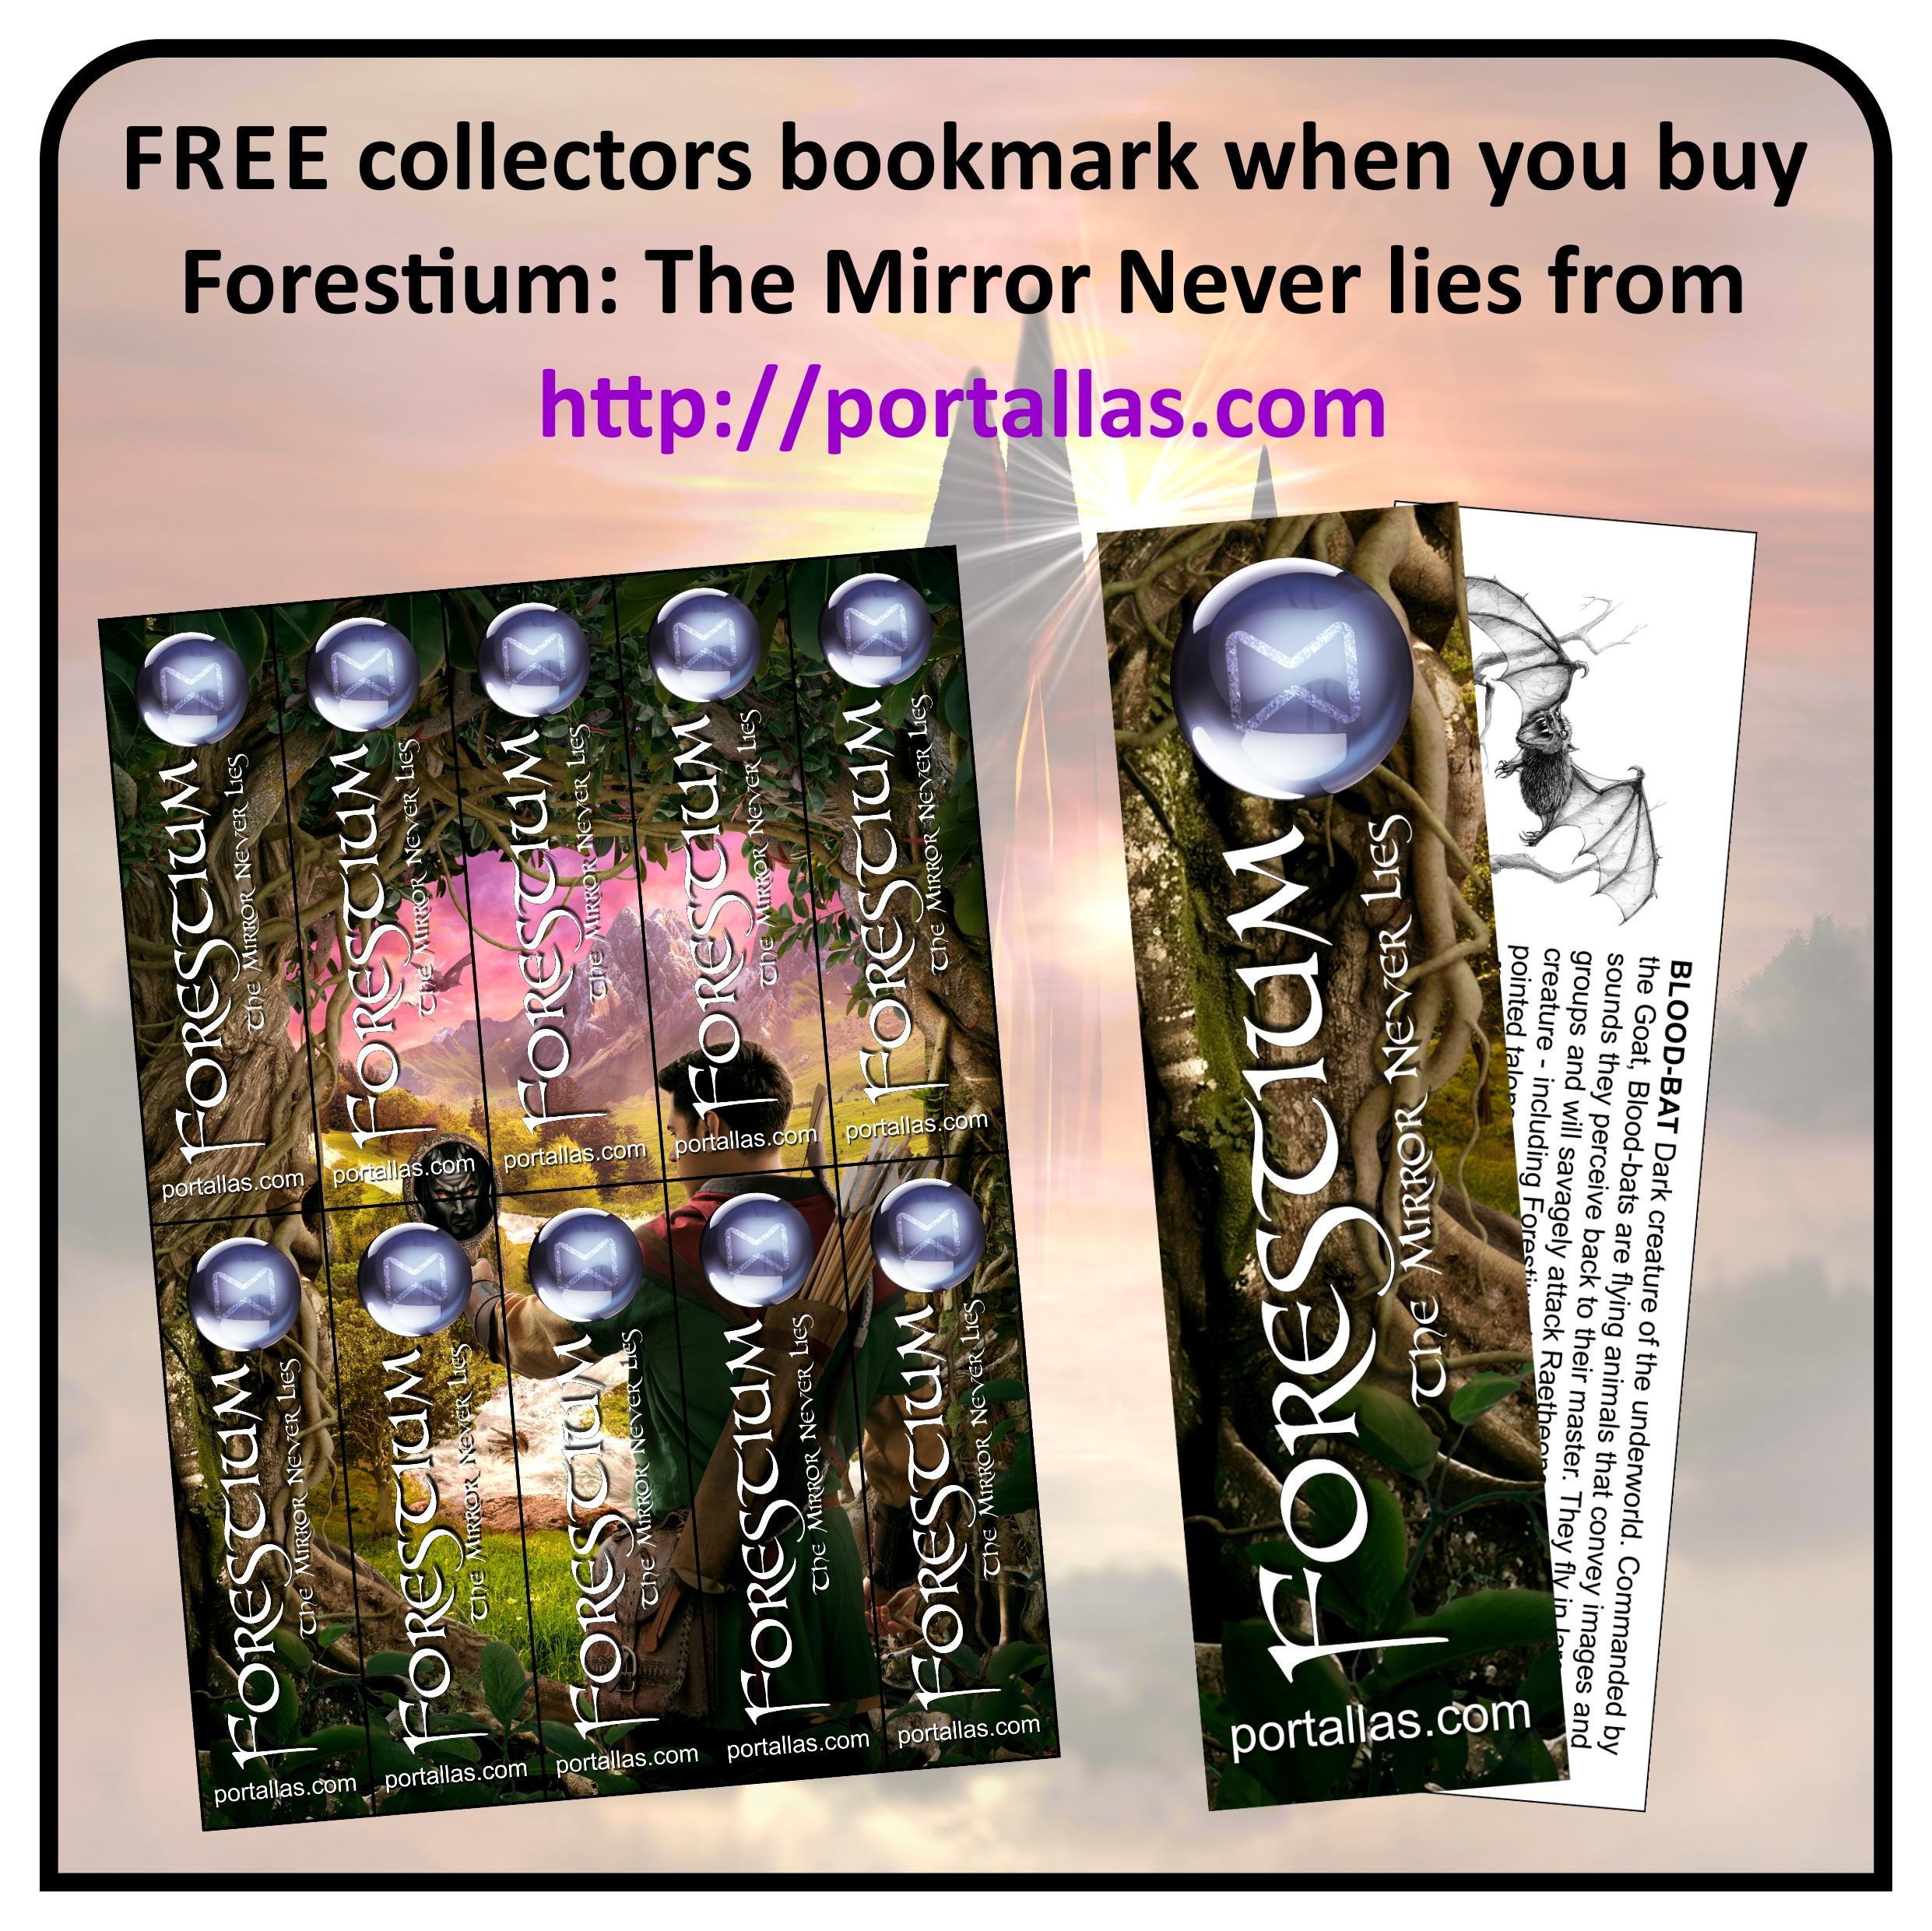 Ad graphic - Portallas themed bookmarks